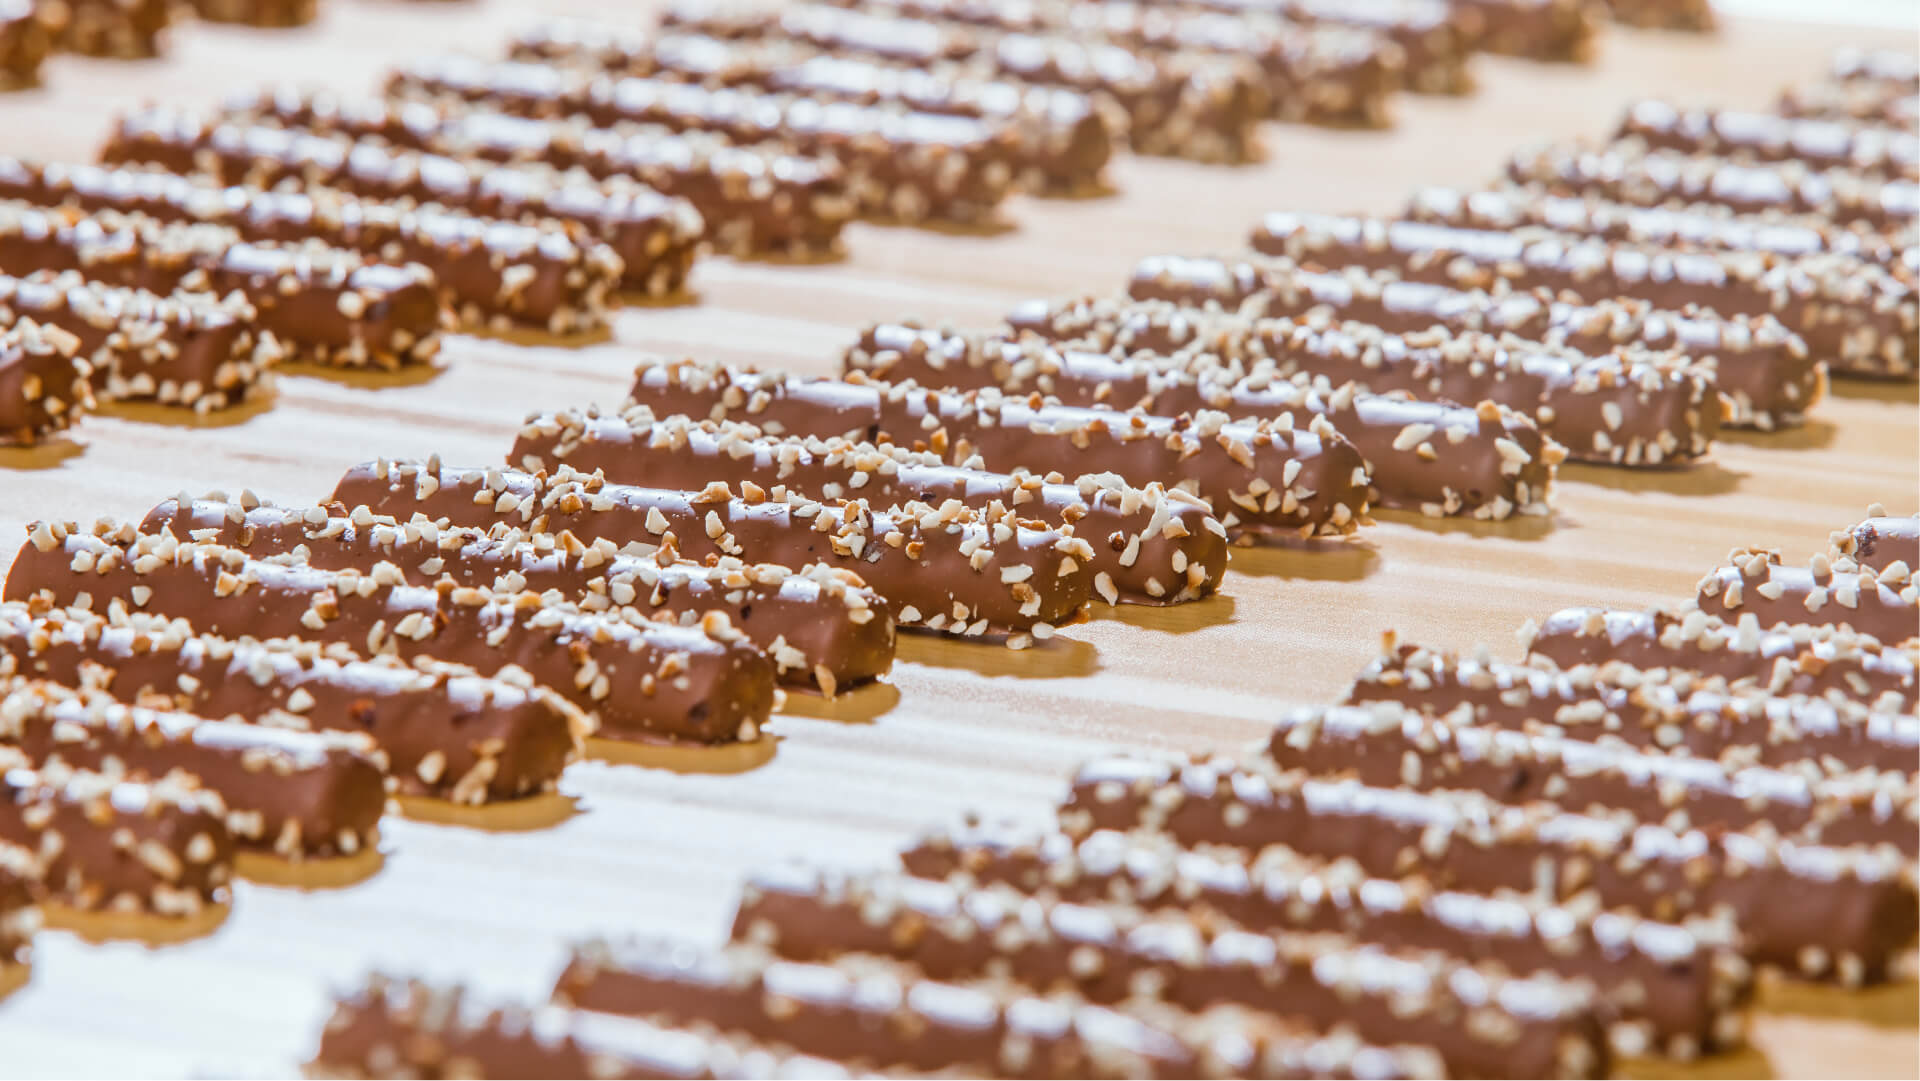 Schokoladenriegeln